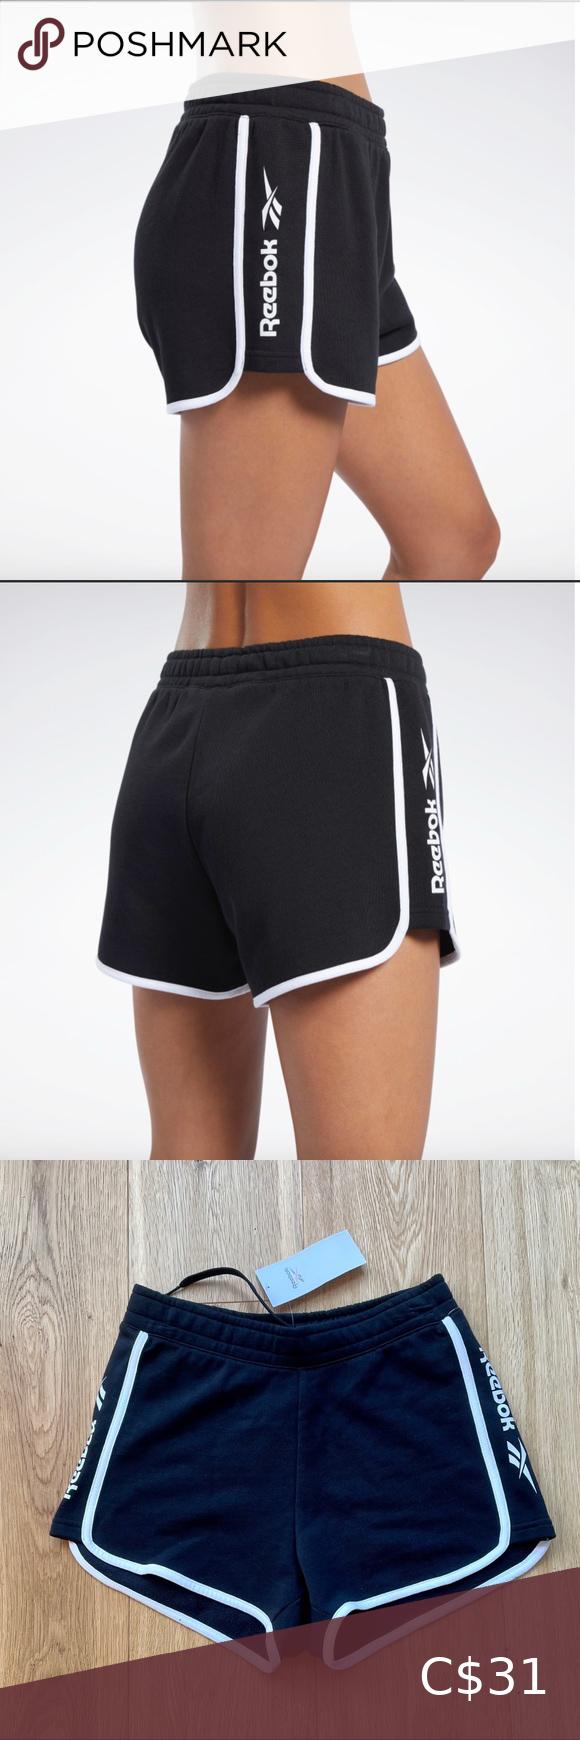 Nwt reebok classics linear shorts - xs NWT REEBOK